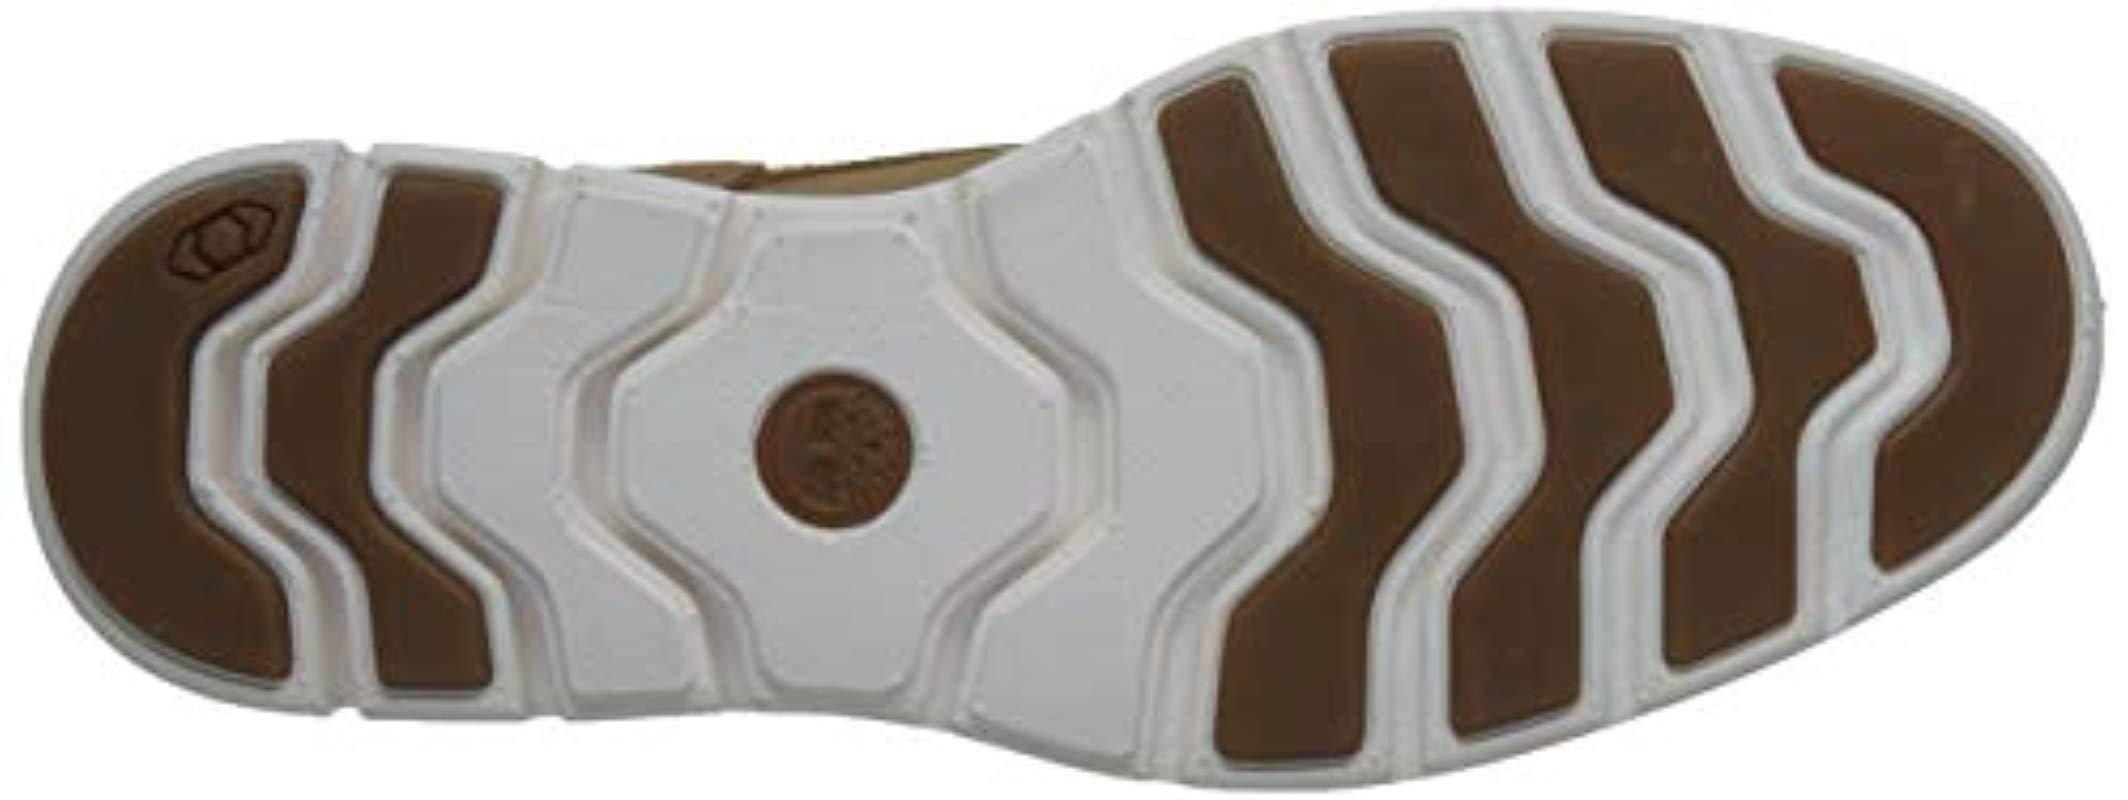 insertar Garantizar tubo  Timberland Bradstreet Leather Sensorflex Chukka Sneakers in Brown for Men -  Lyst